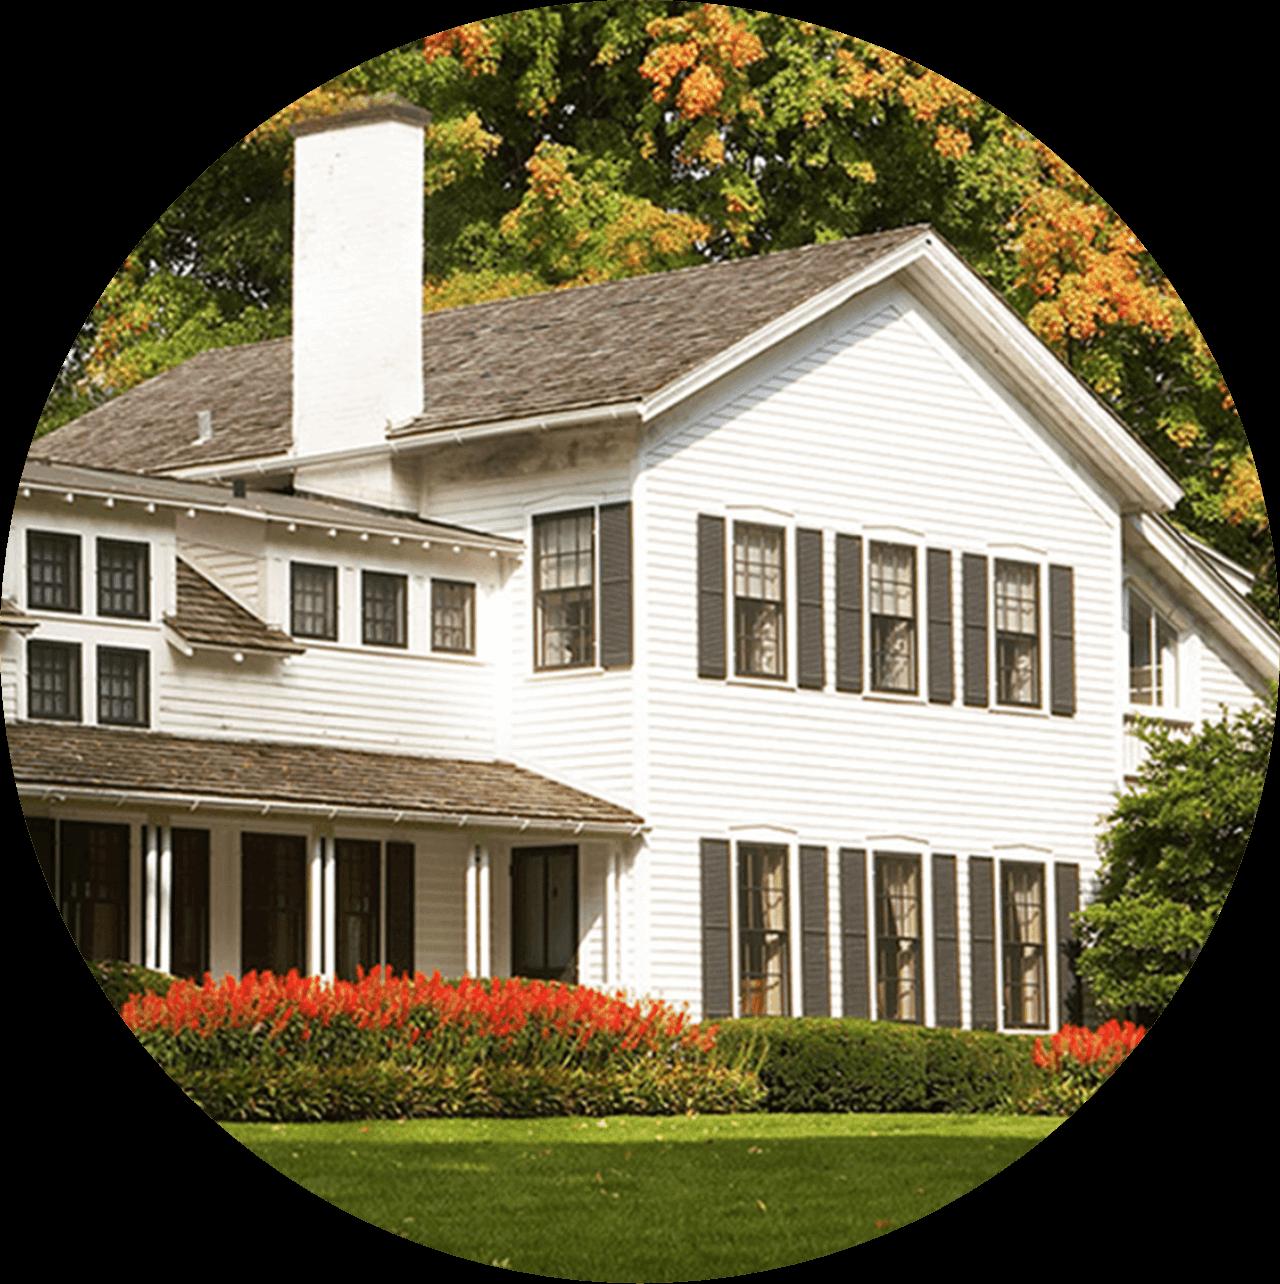 Our Iconic Farmhouse